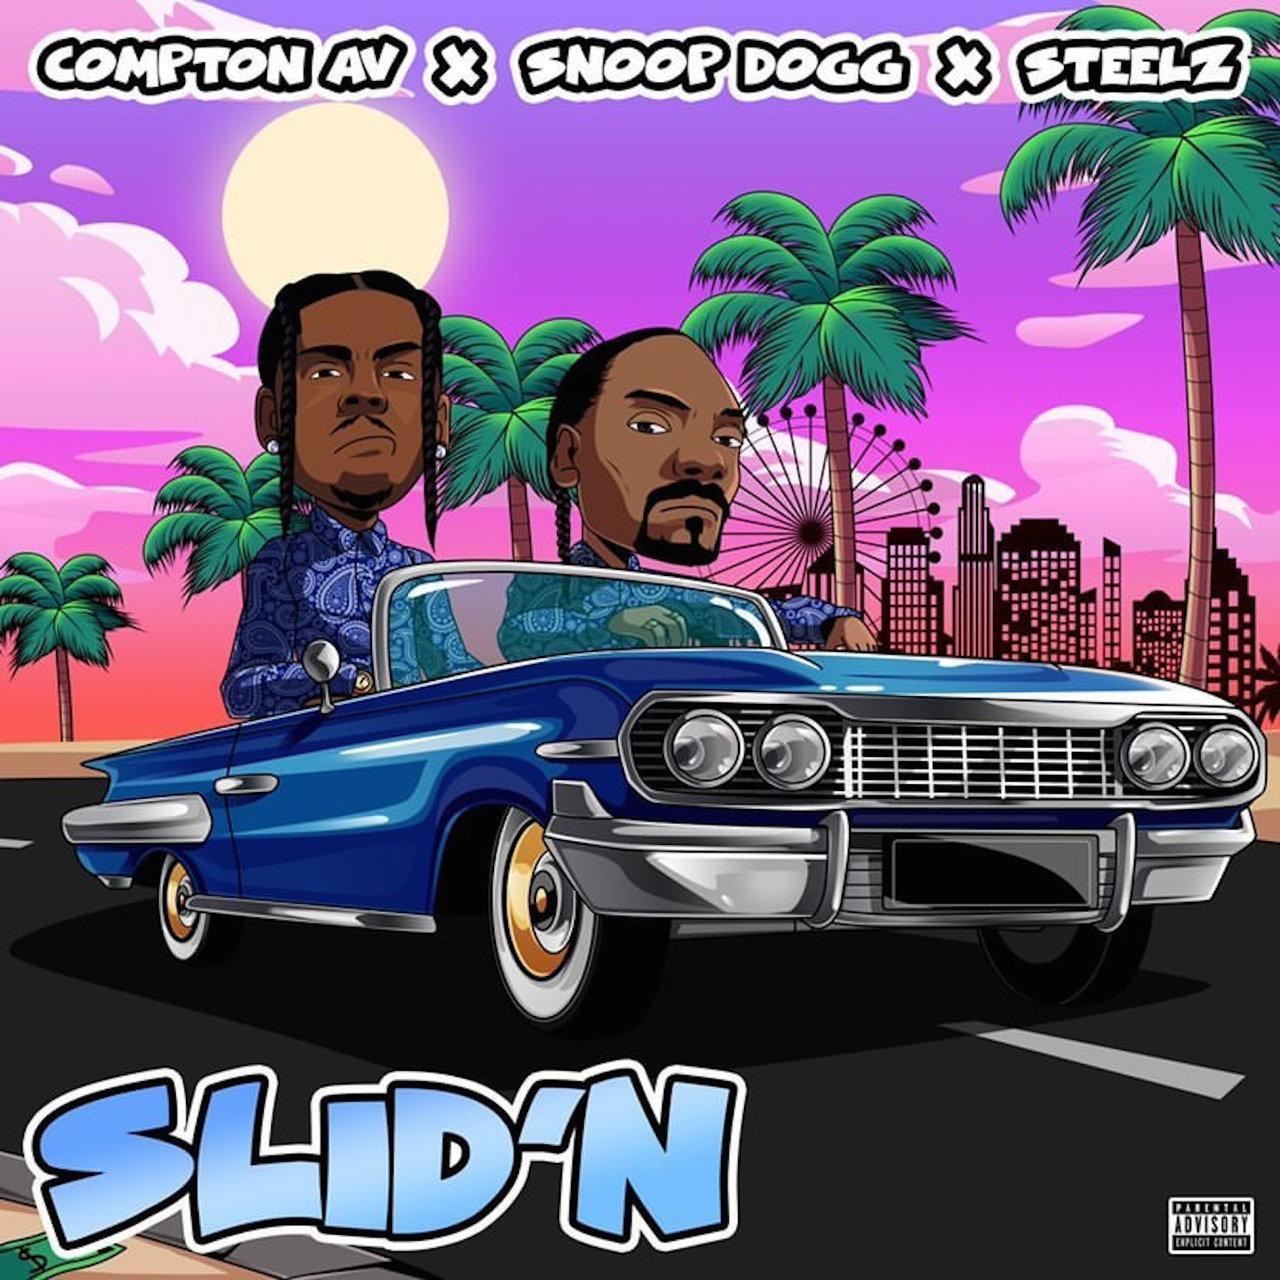 Compton Av, Snoop Dogg, Steelz 'Sliding' Song